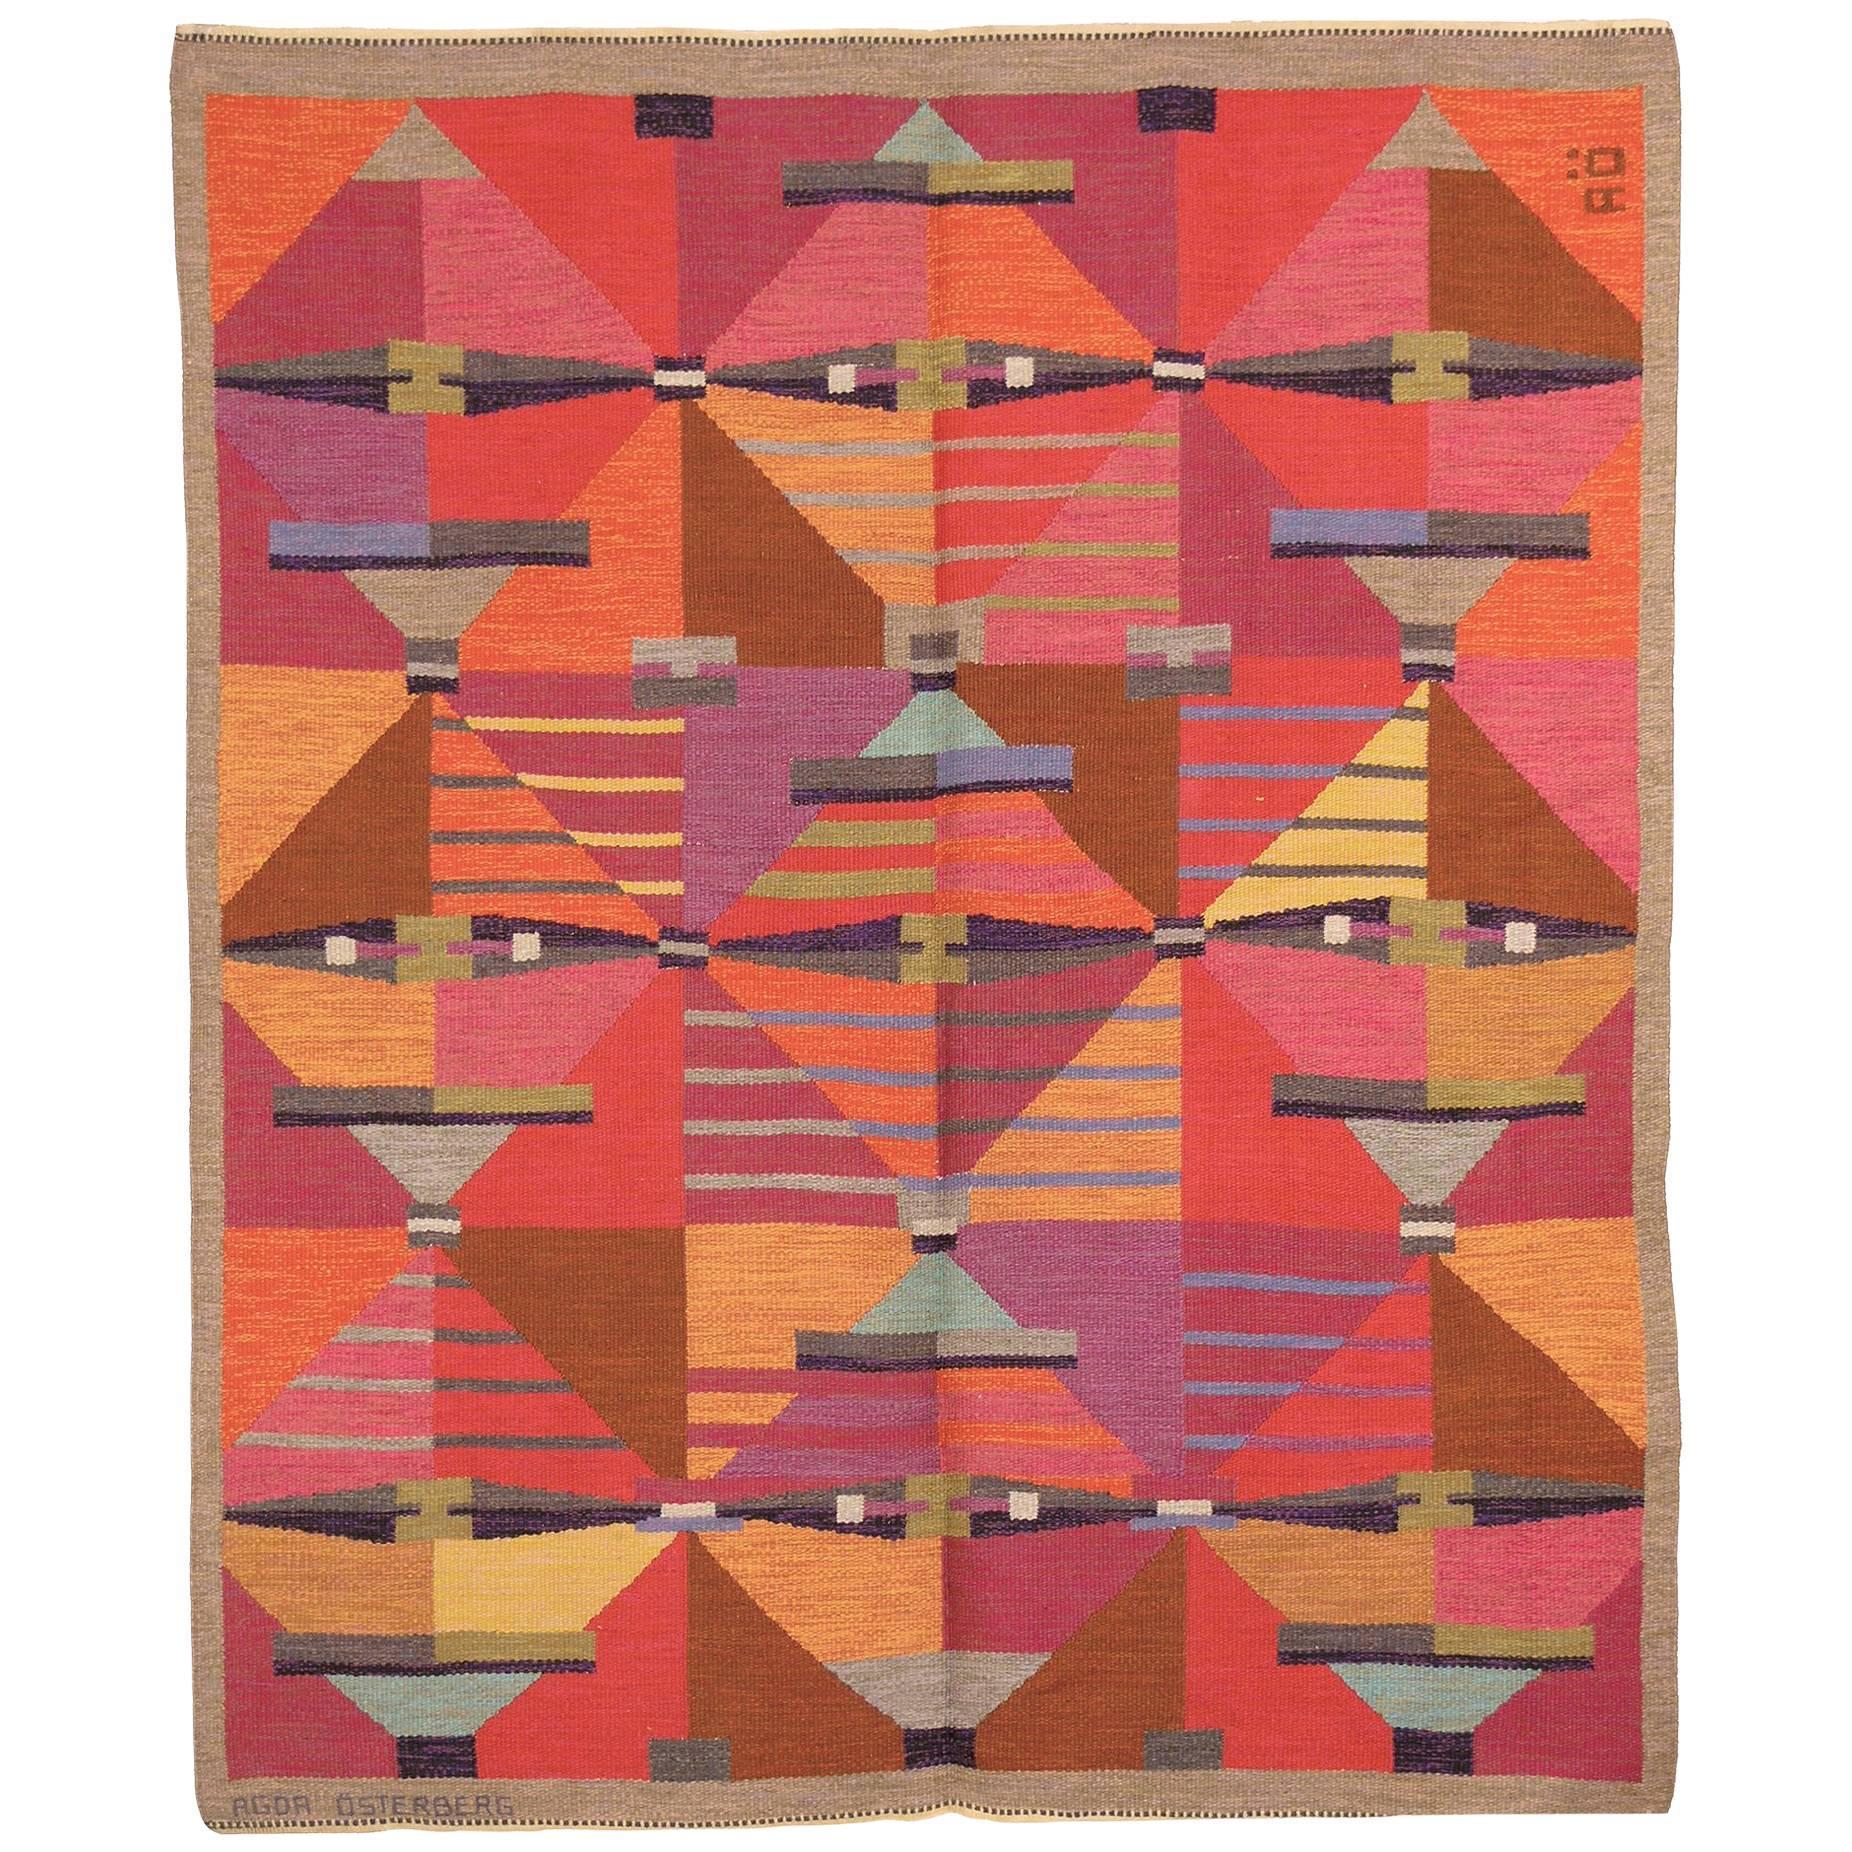 Swedish Flat-Weave Carpet by Agda Osterberg, 1960